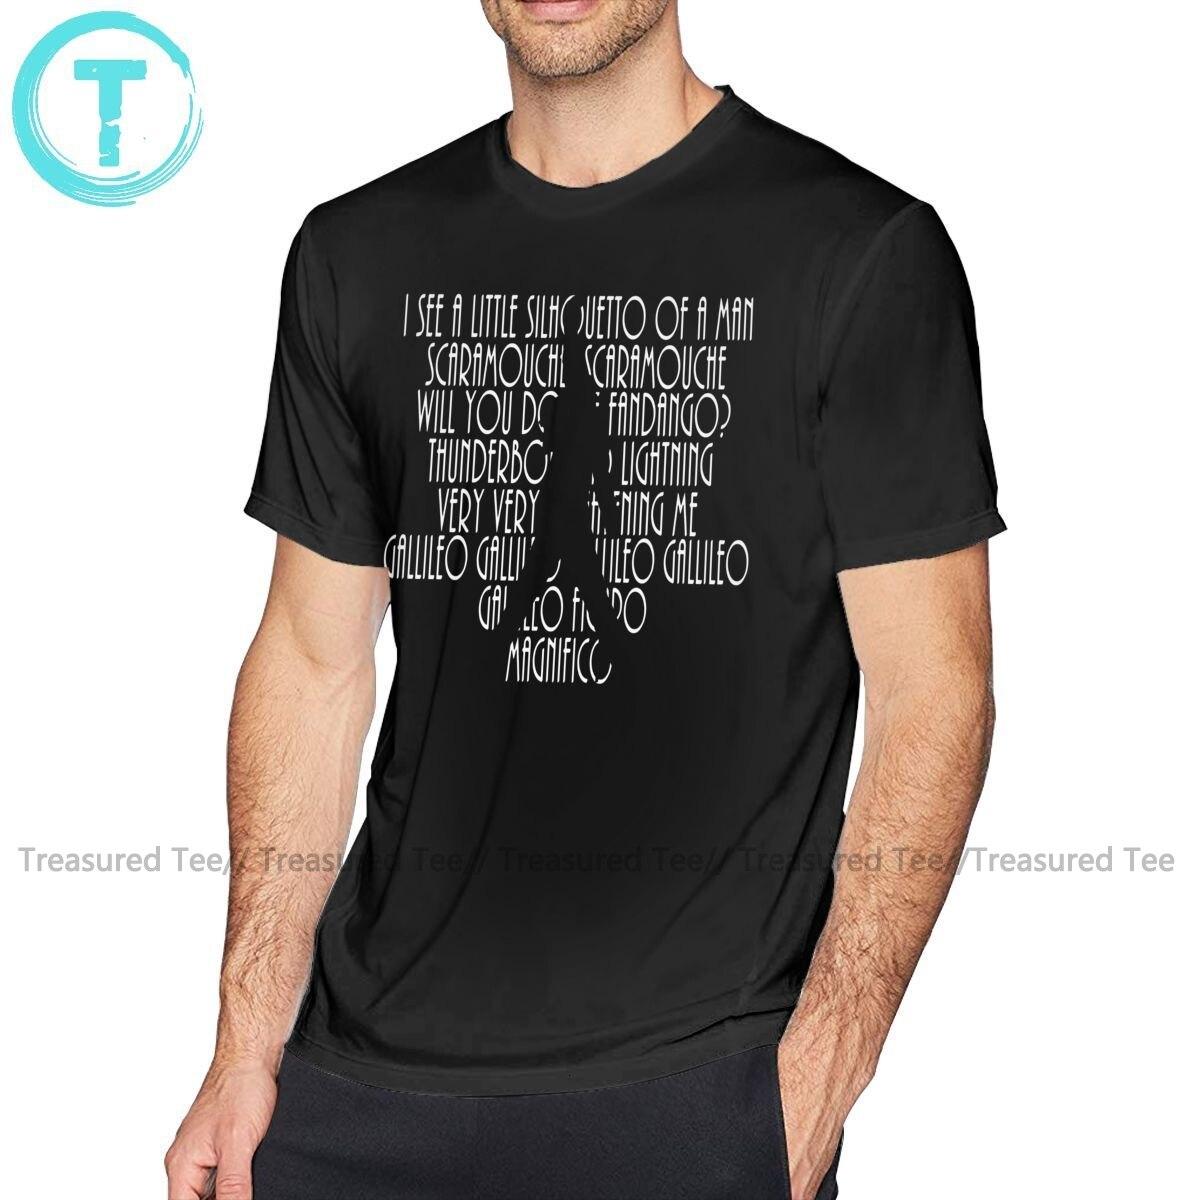 Camiseta Bohemia Rhapsody, camiseta Bohemia Rhapsody, Camiseta estampada de manga corta, camiseta divertida